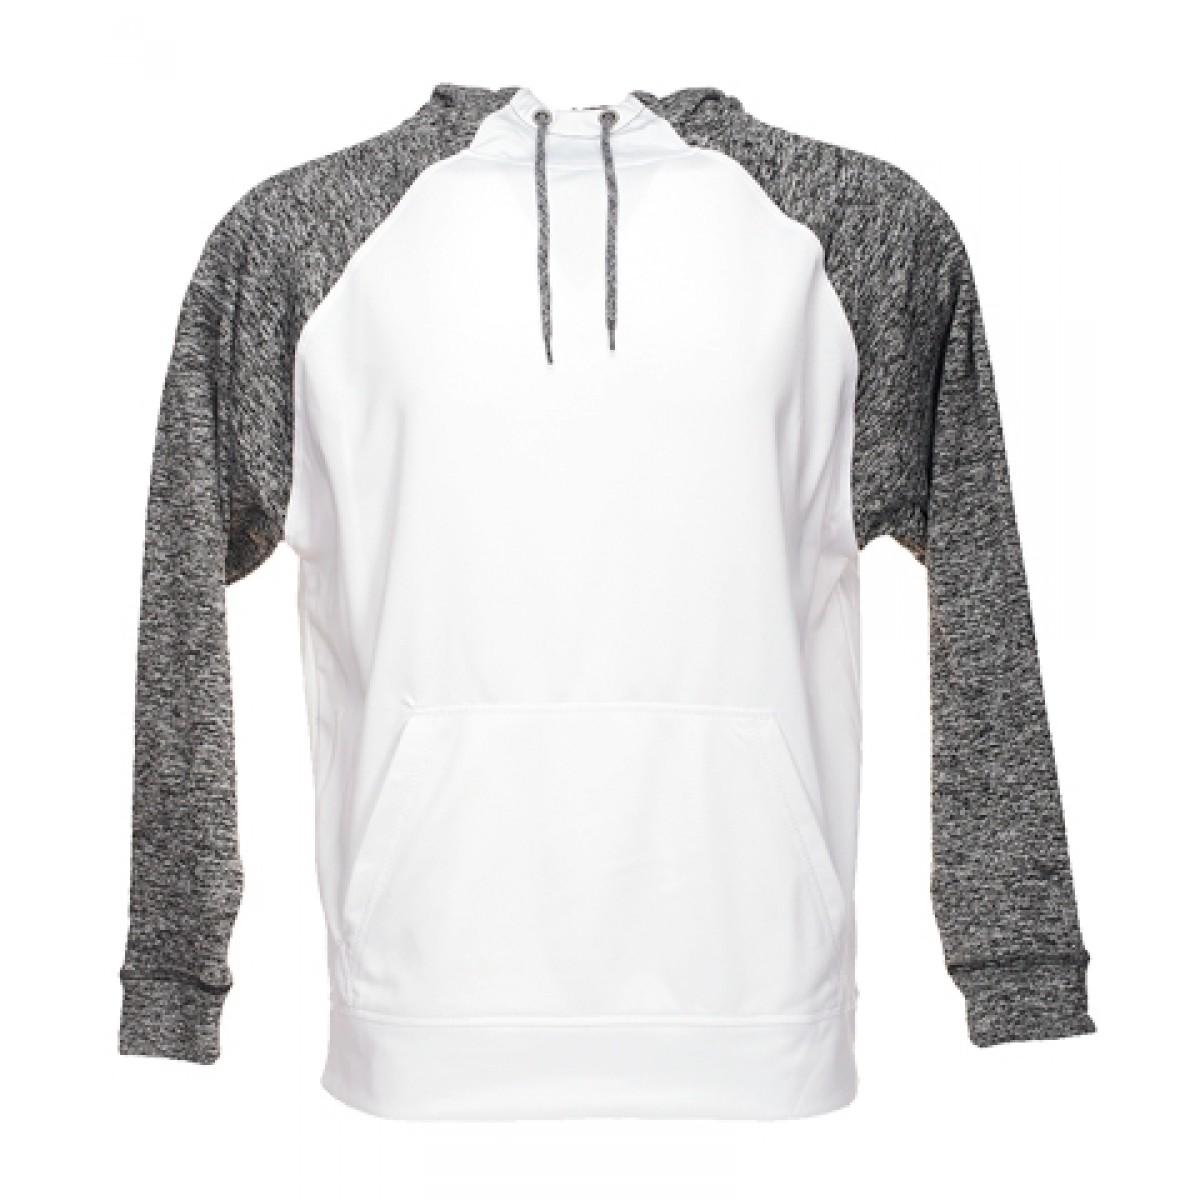 J America Cosmic Hooded Sweatshirt-White/Black-3XL